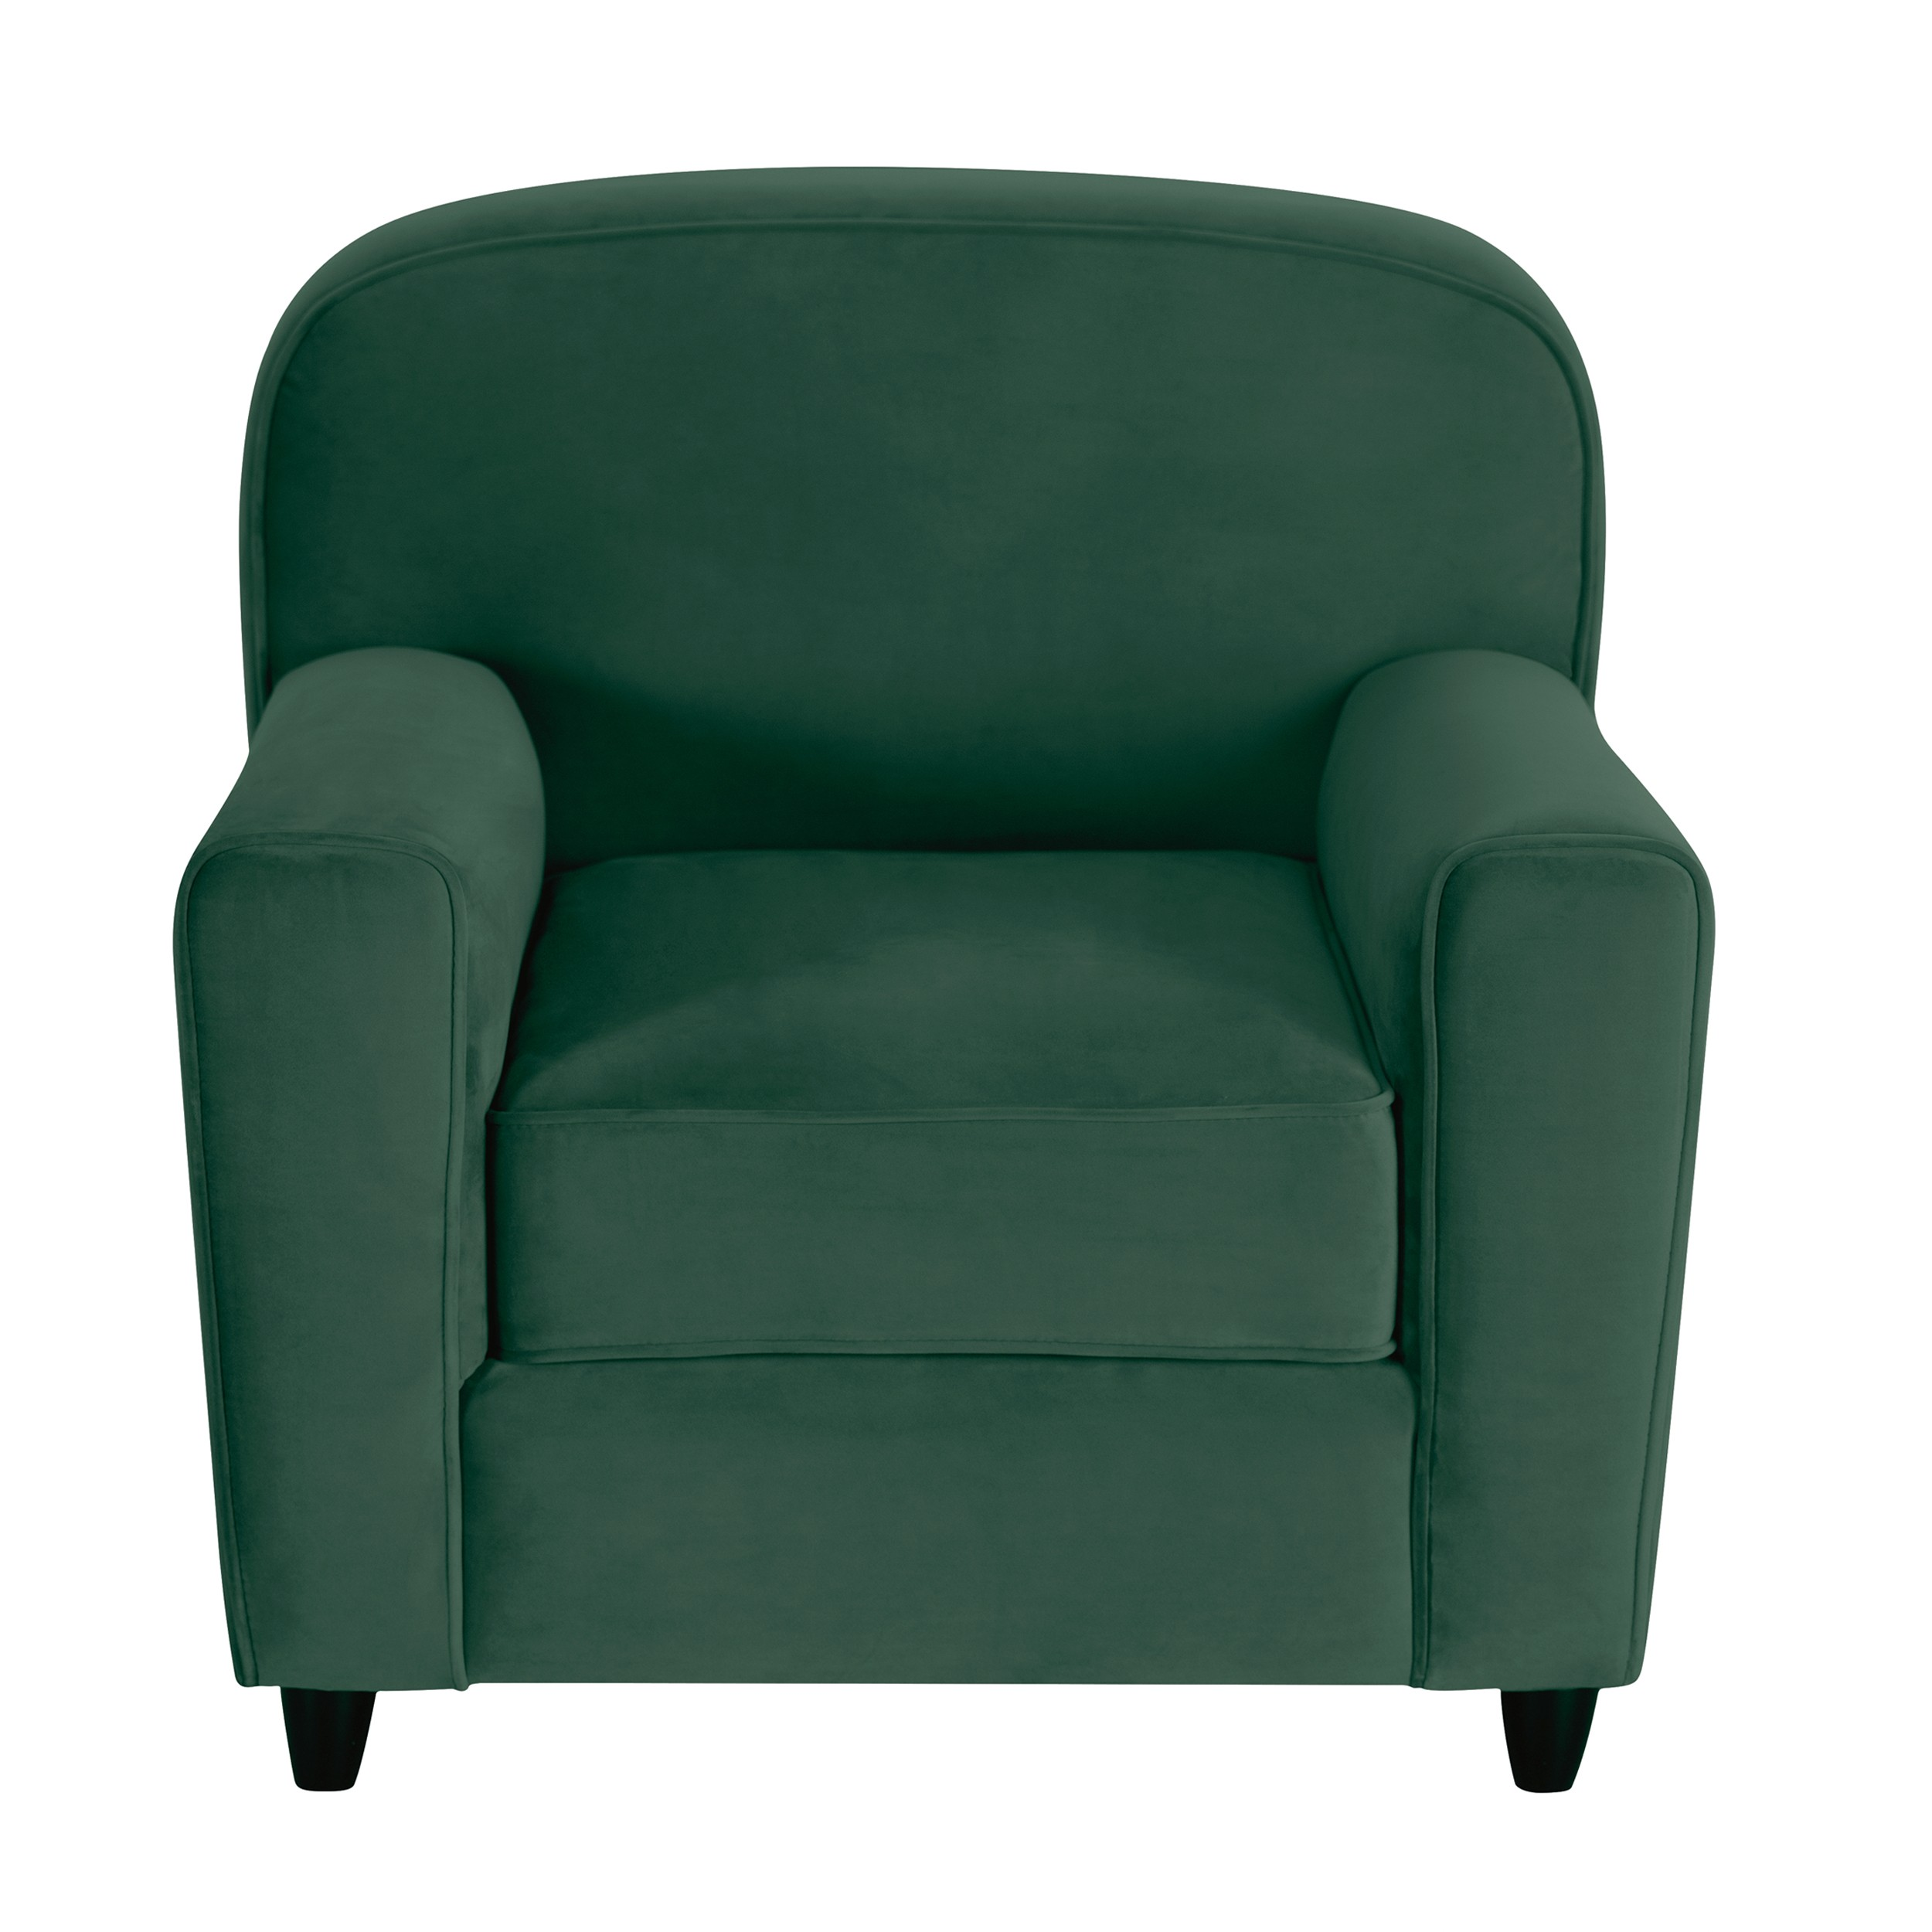 acheter fauteuil en velours vert club